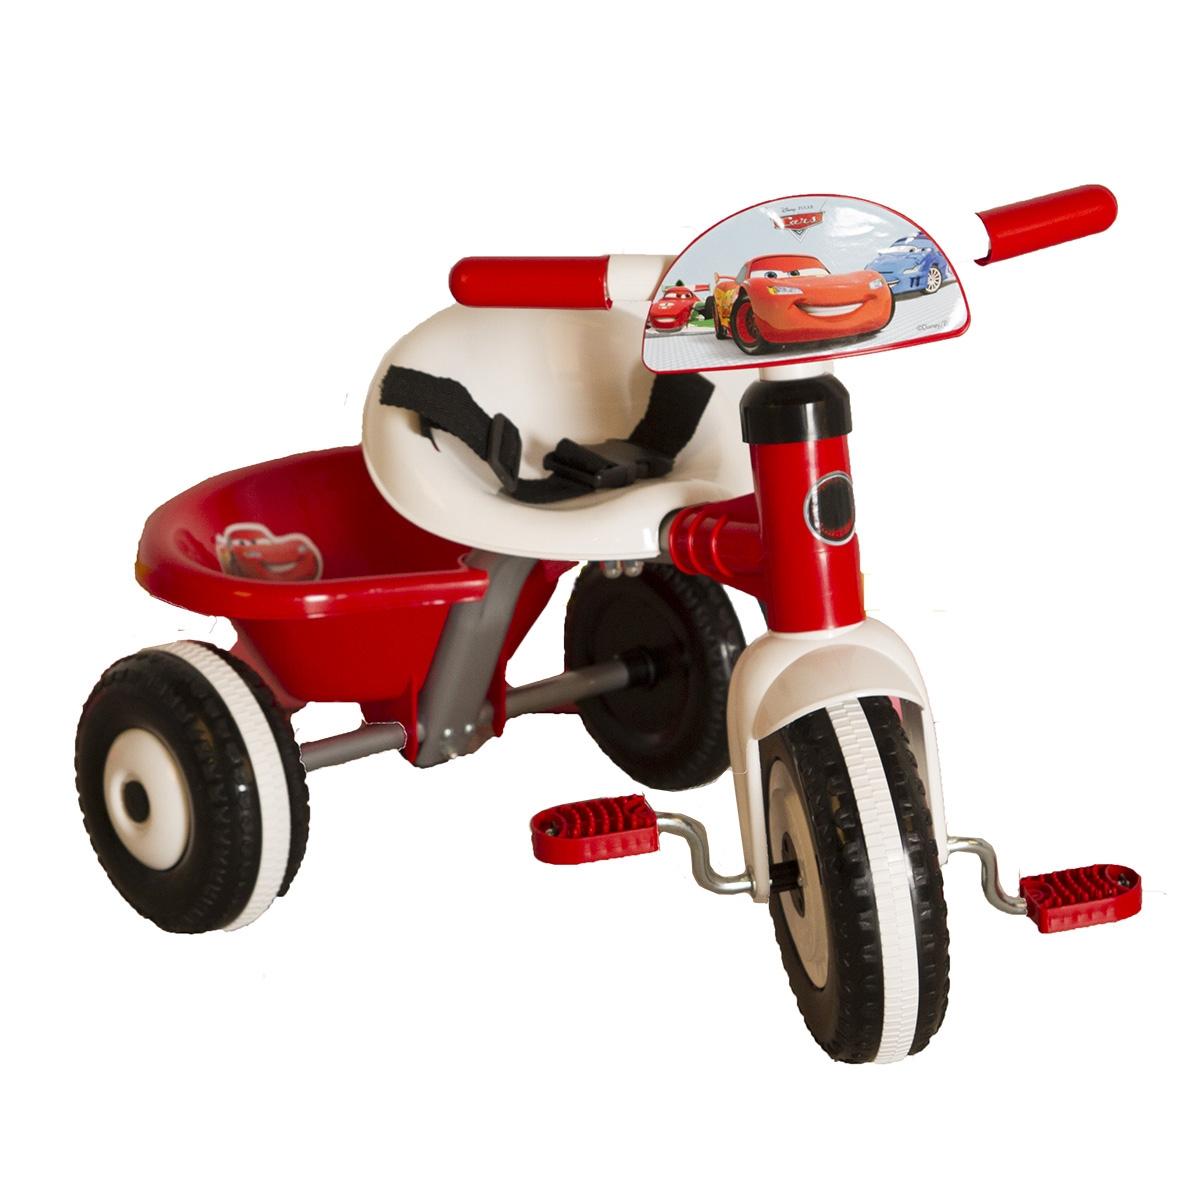 Cars Fr56259 Furkan Toys şimsek Mcqueen Bisiklet 2 Yaş